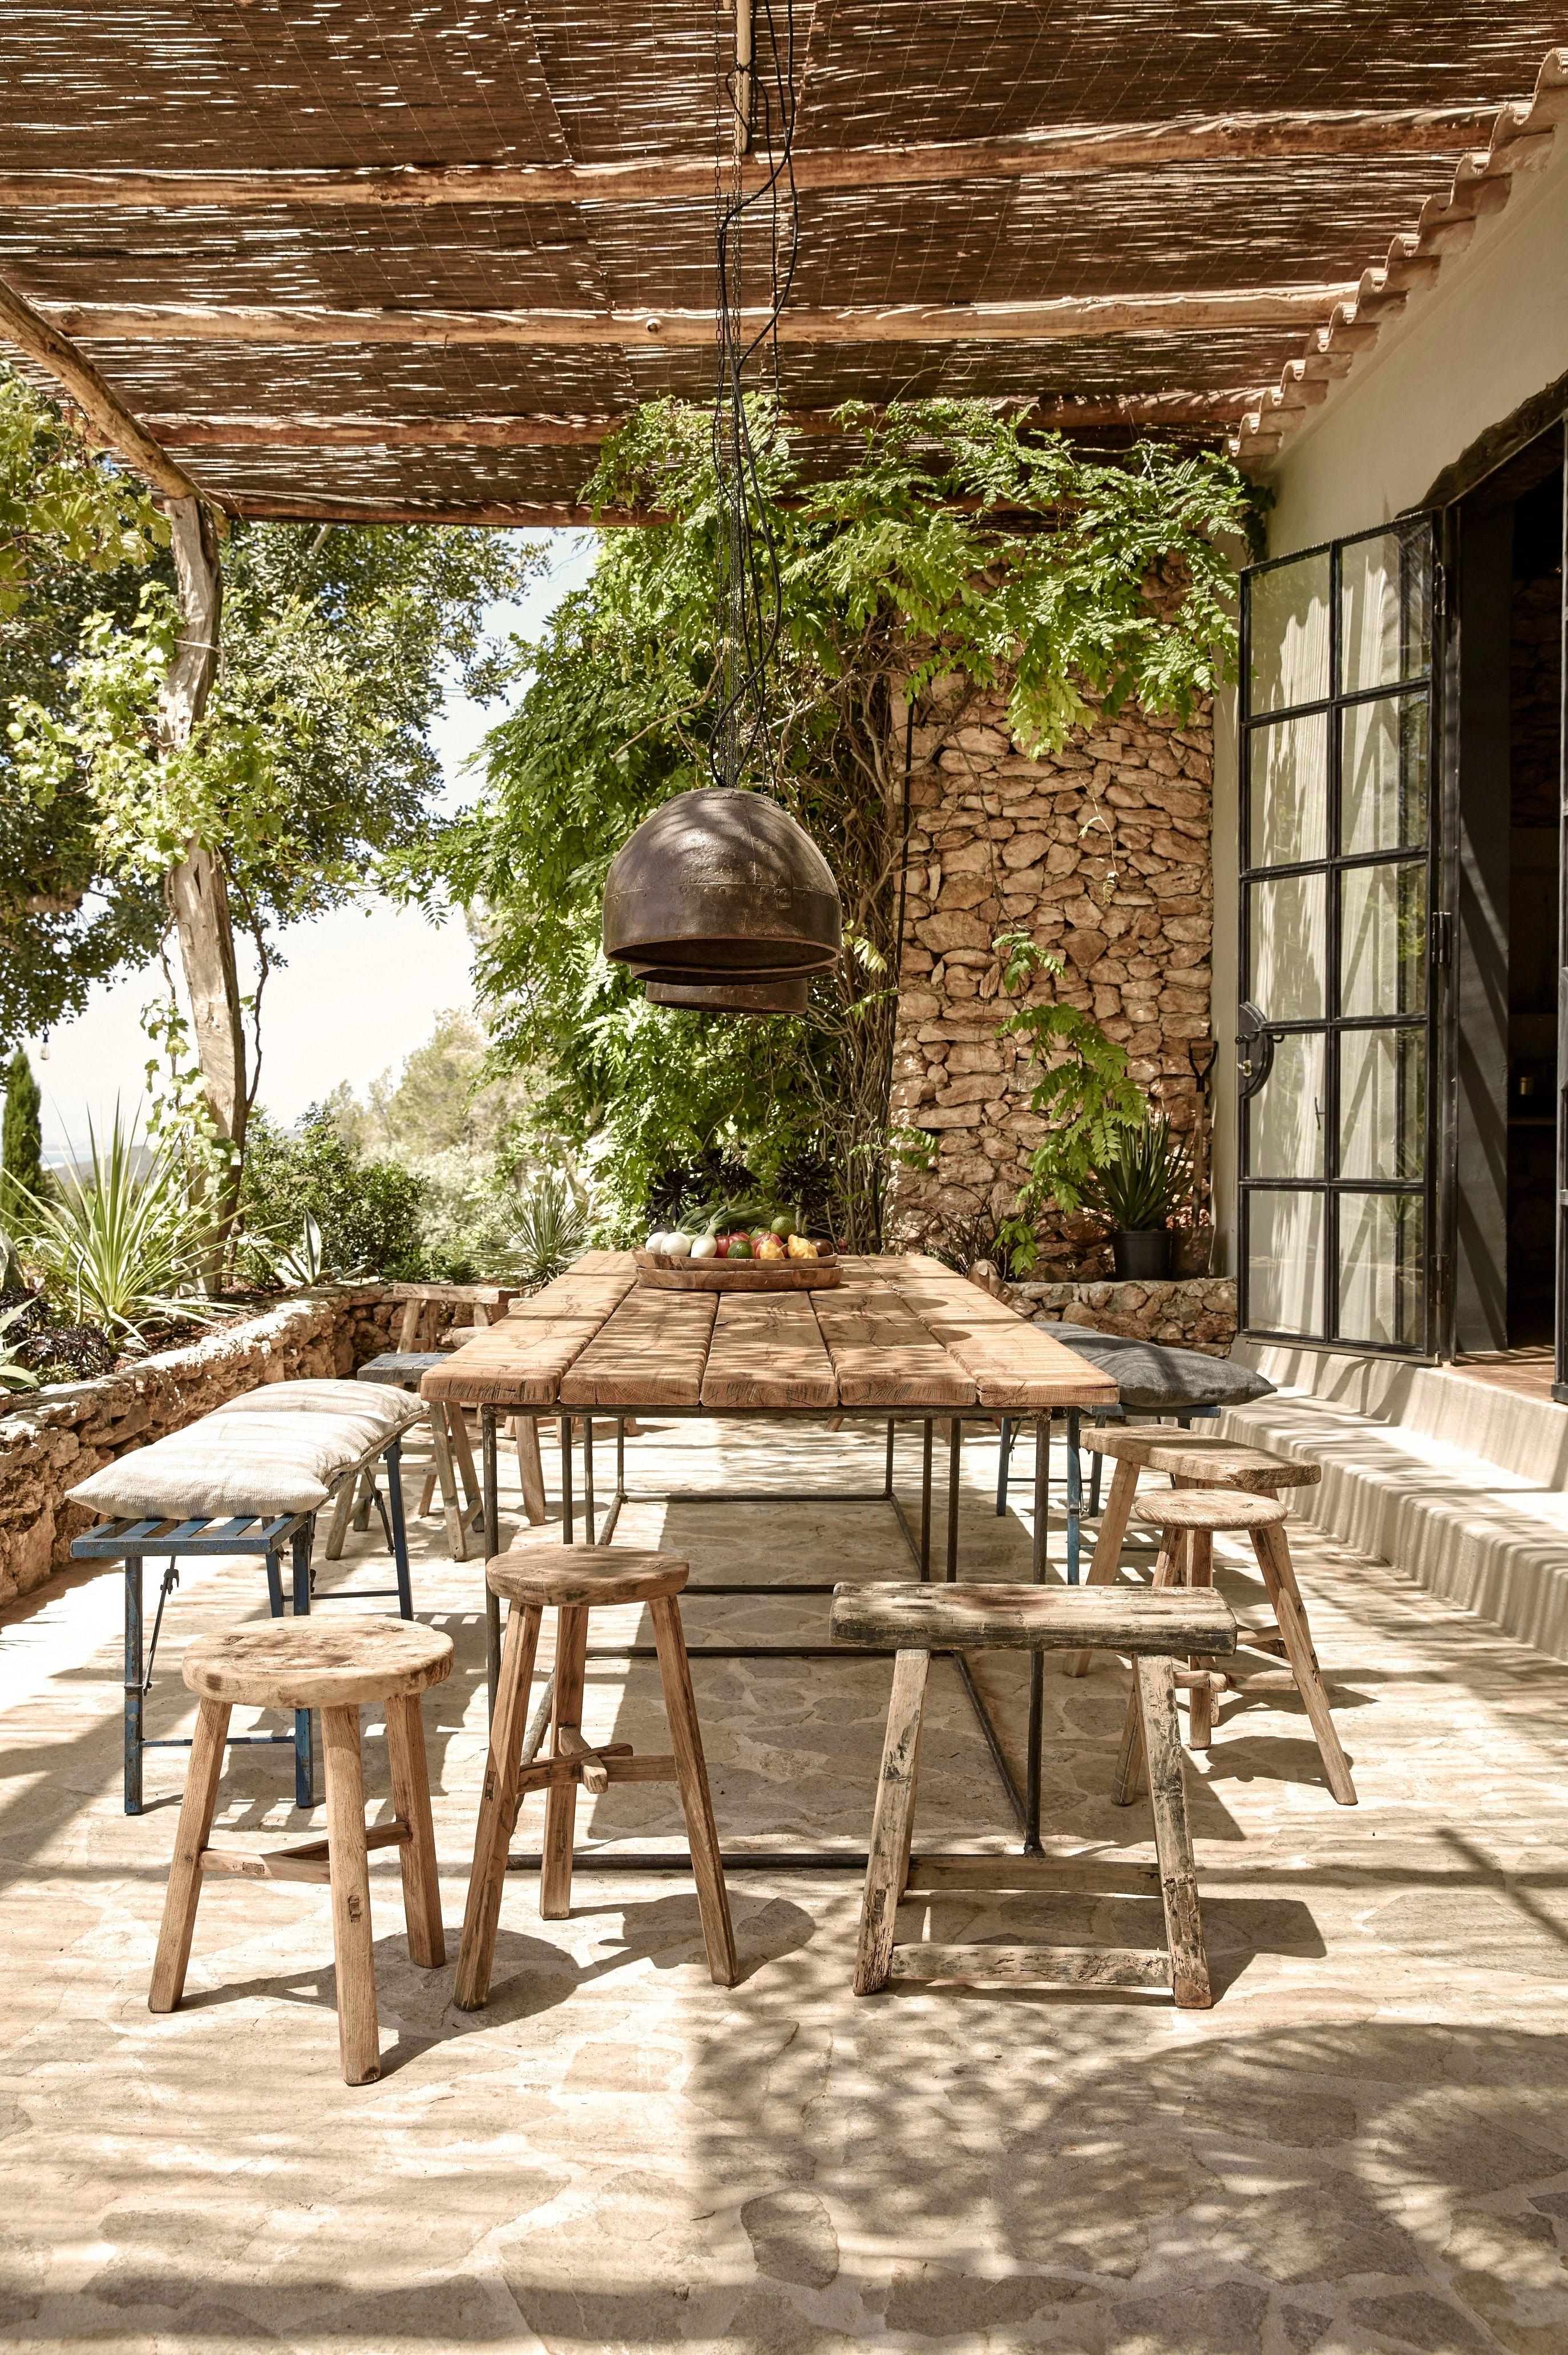 Hotel with a History: A Landscape of Sun and Stone at La Granja Ibiza